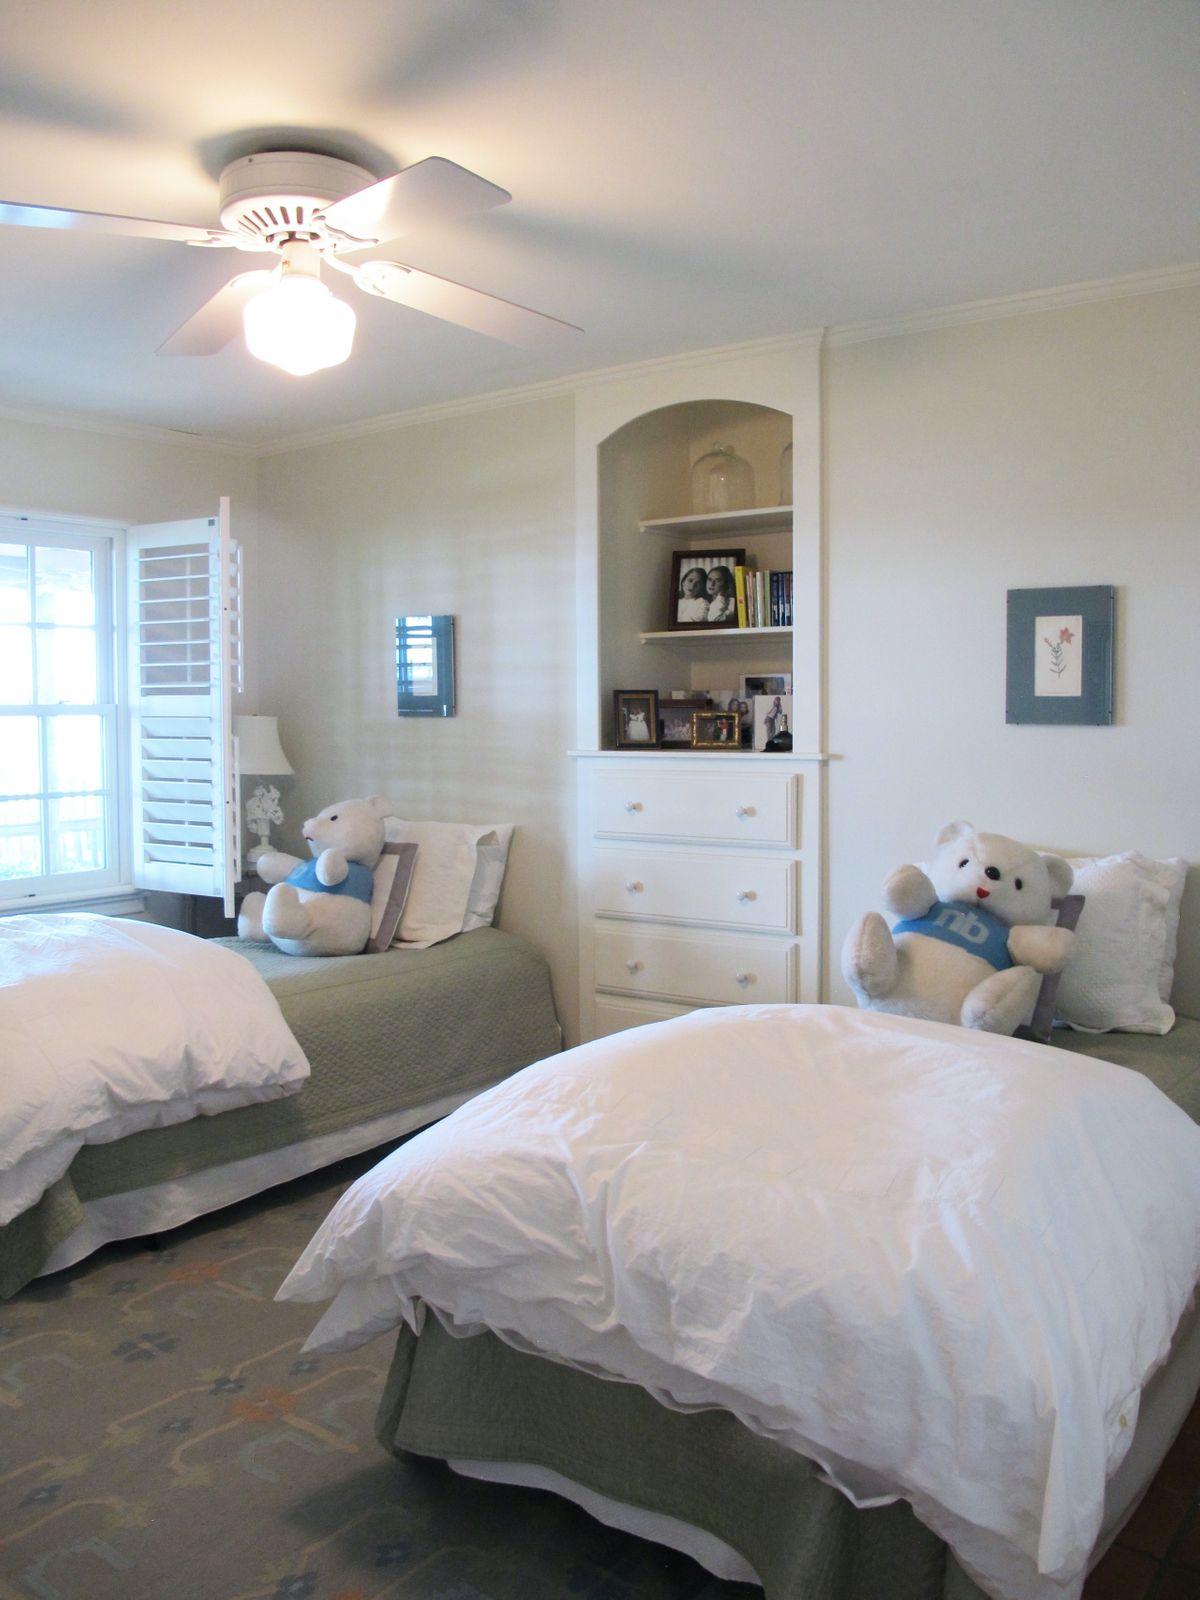 Pola Lakehouse Video Shoot Location Homes Dallas 38.jpg